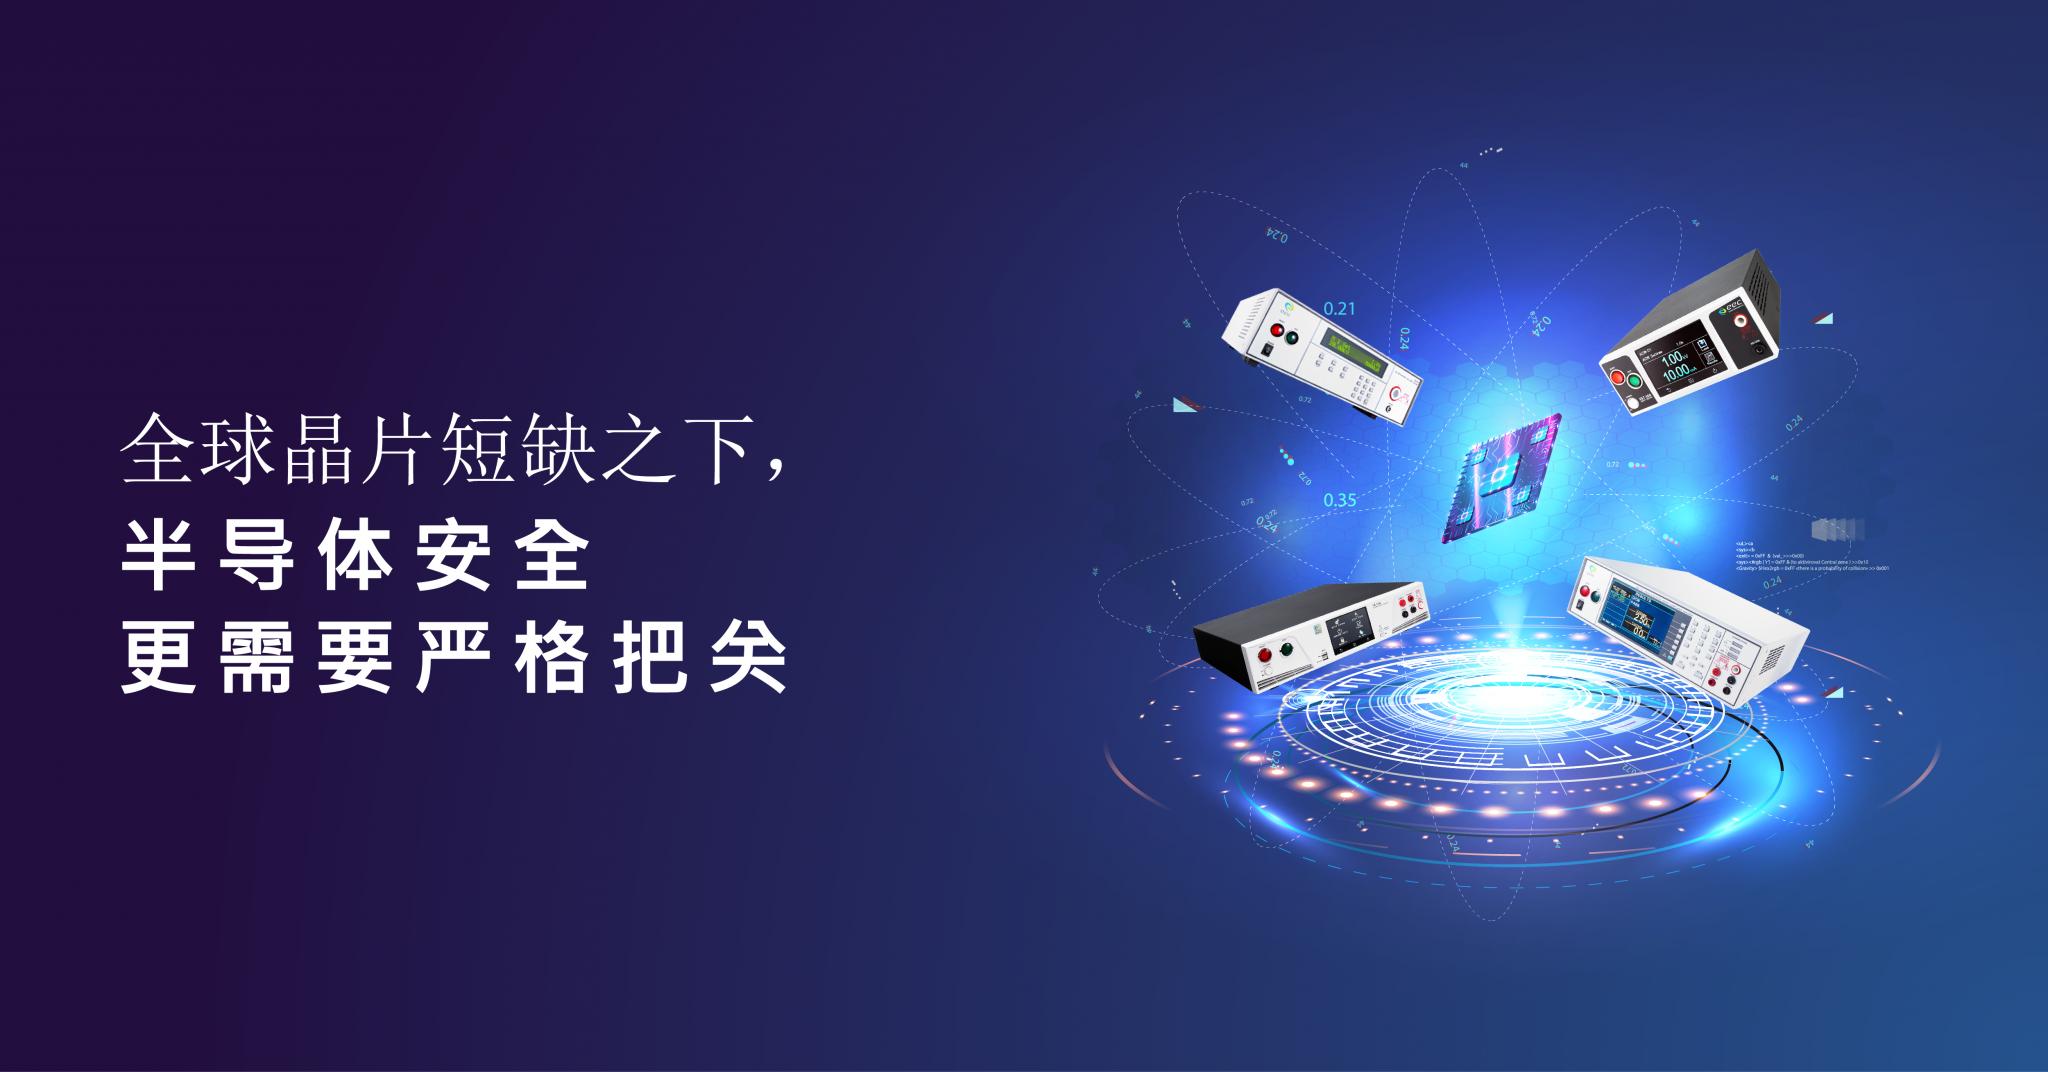 【EEC台湾华仪】面对全球芯片短缺,半导体安全更需要严格把关